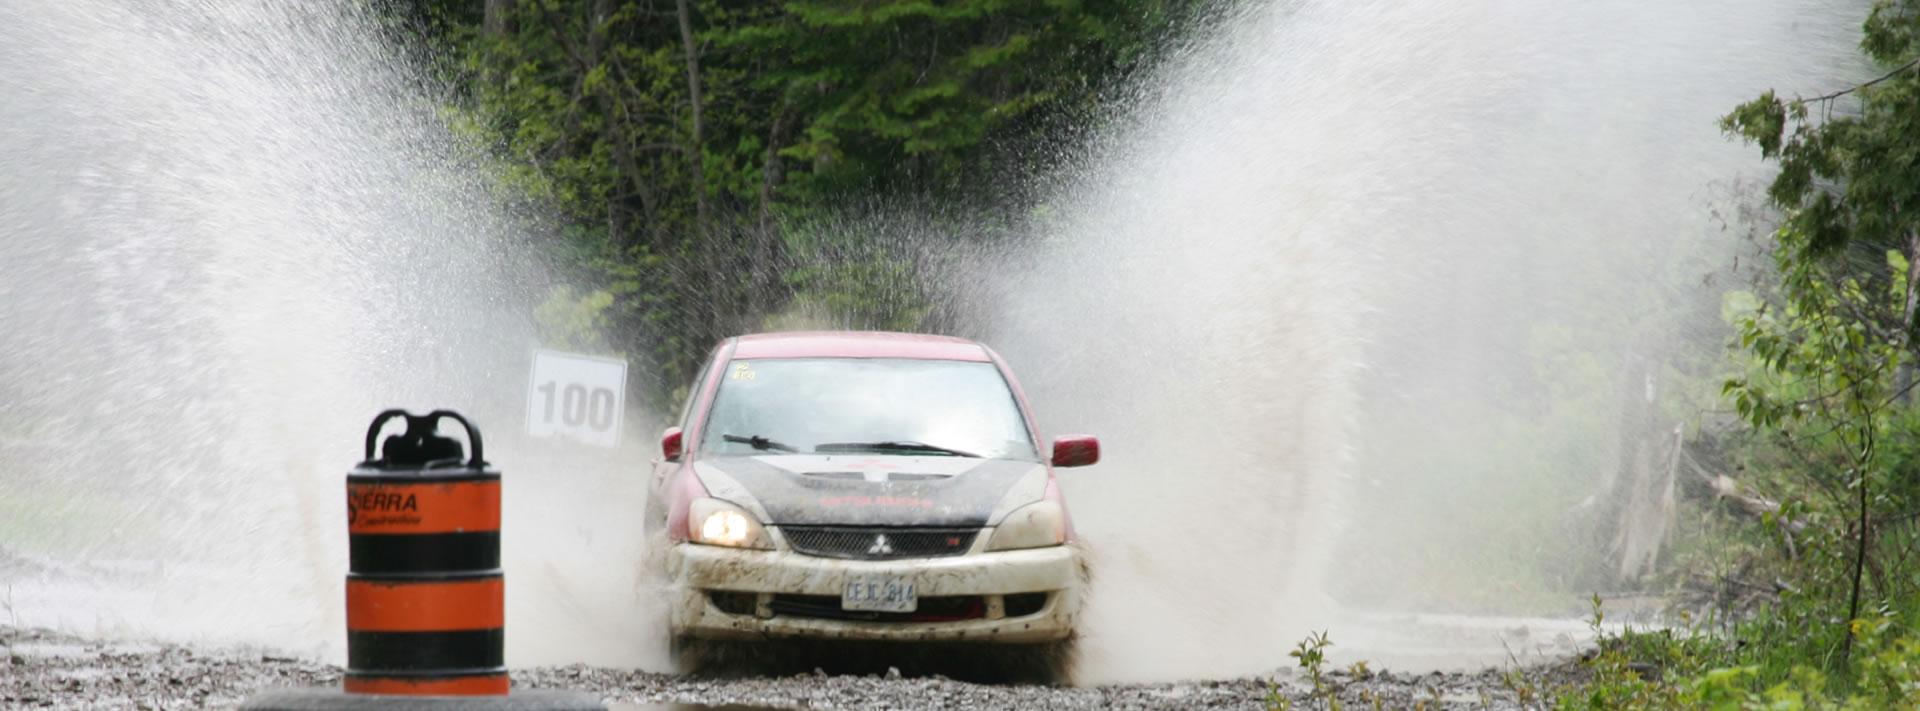 PMSC Rallycross Mitsubishi Lancer Ralliart